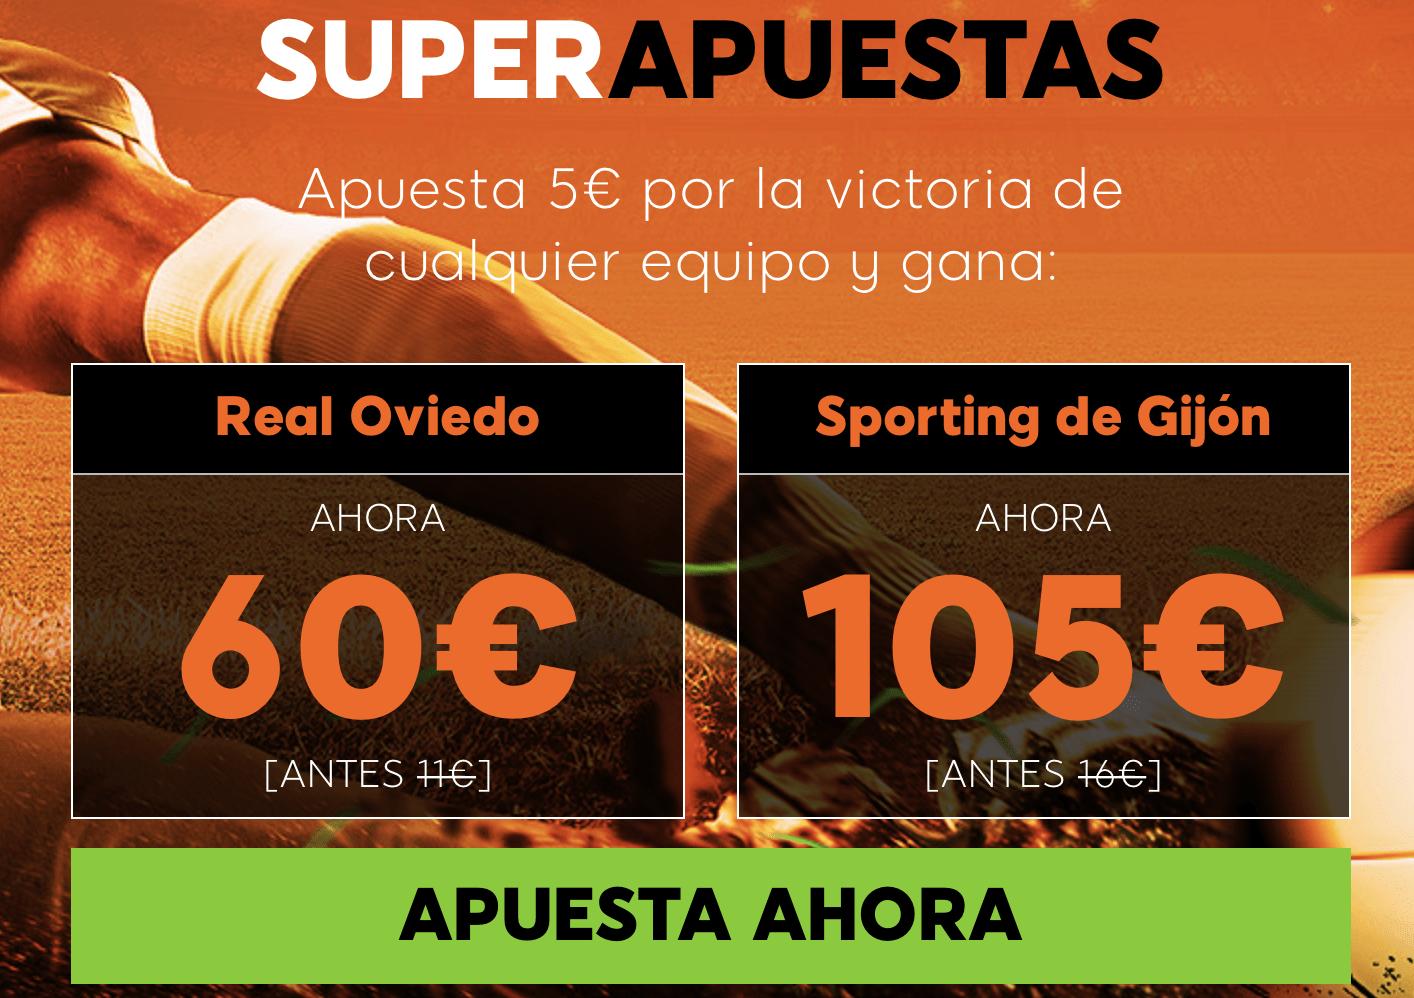 Supercuotas 888sport Oviedo - Sporting Gijón